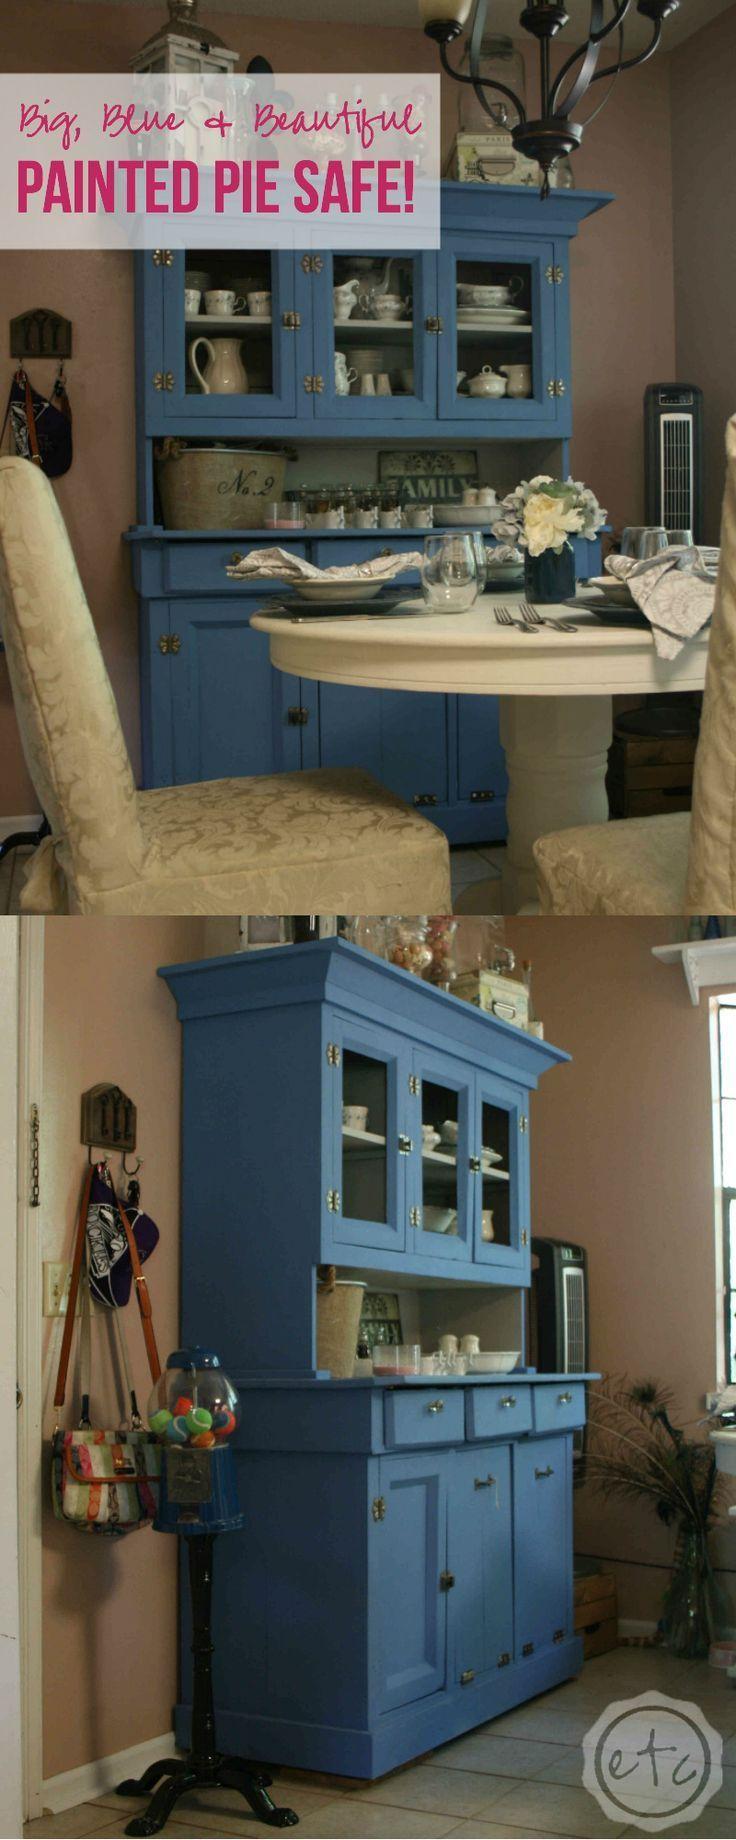 image vintage kitchen craft ideas. Big, Blue \u0026 Beautiful - Painted Pie Safe Image Vintage Kitchen Craft Ideas O